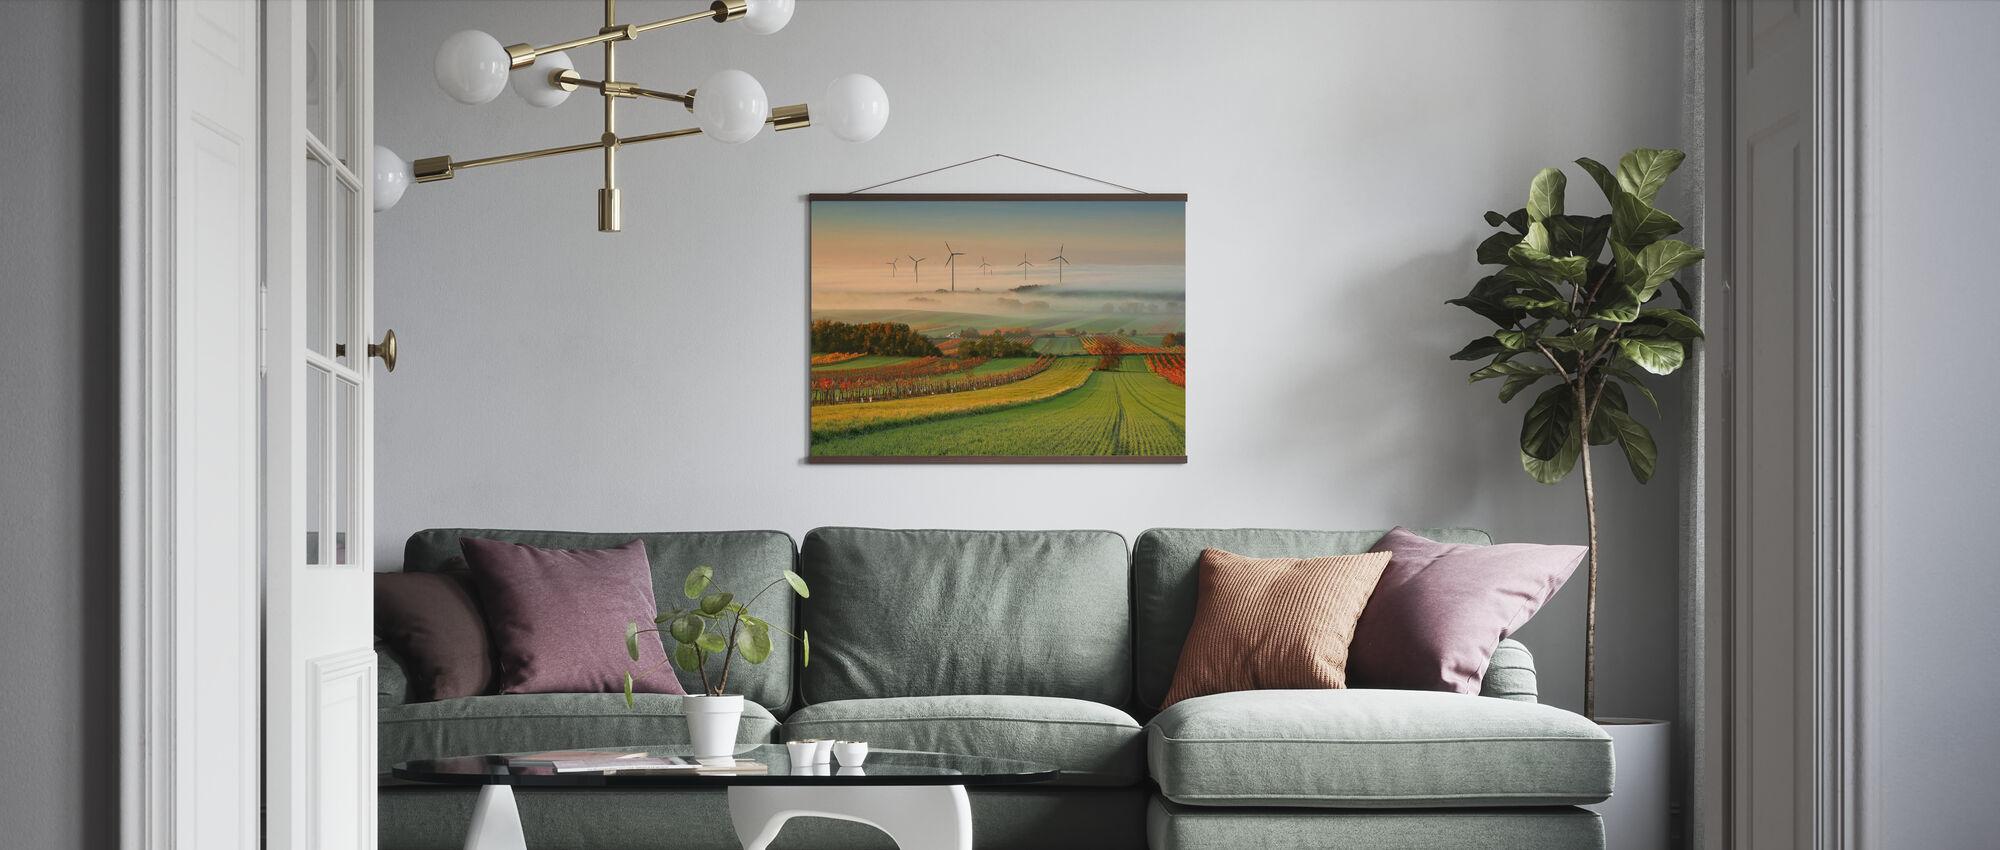 Autumn Atmosphere in Vineyards - Poster - Living Room